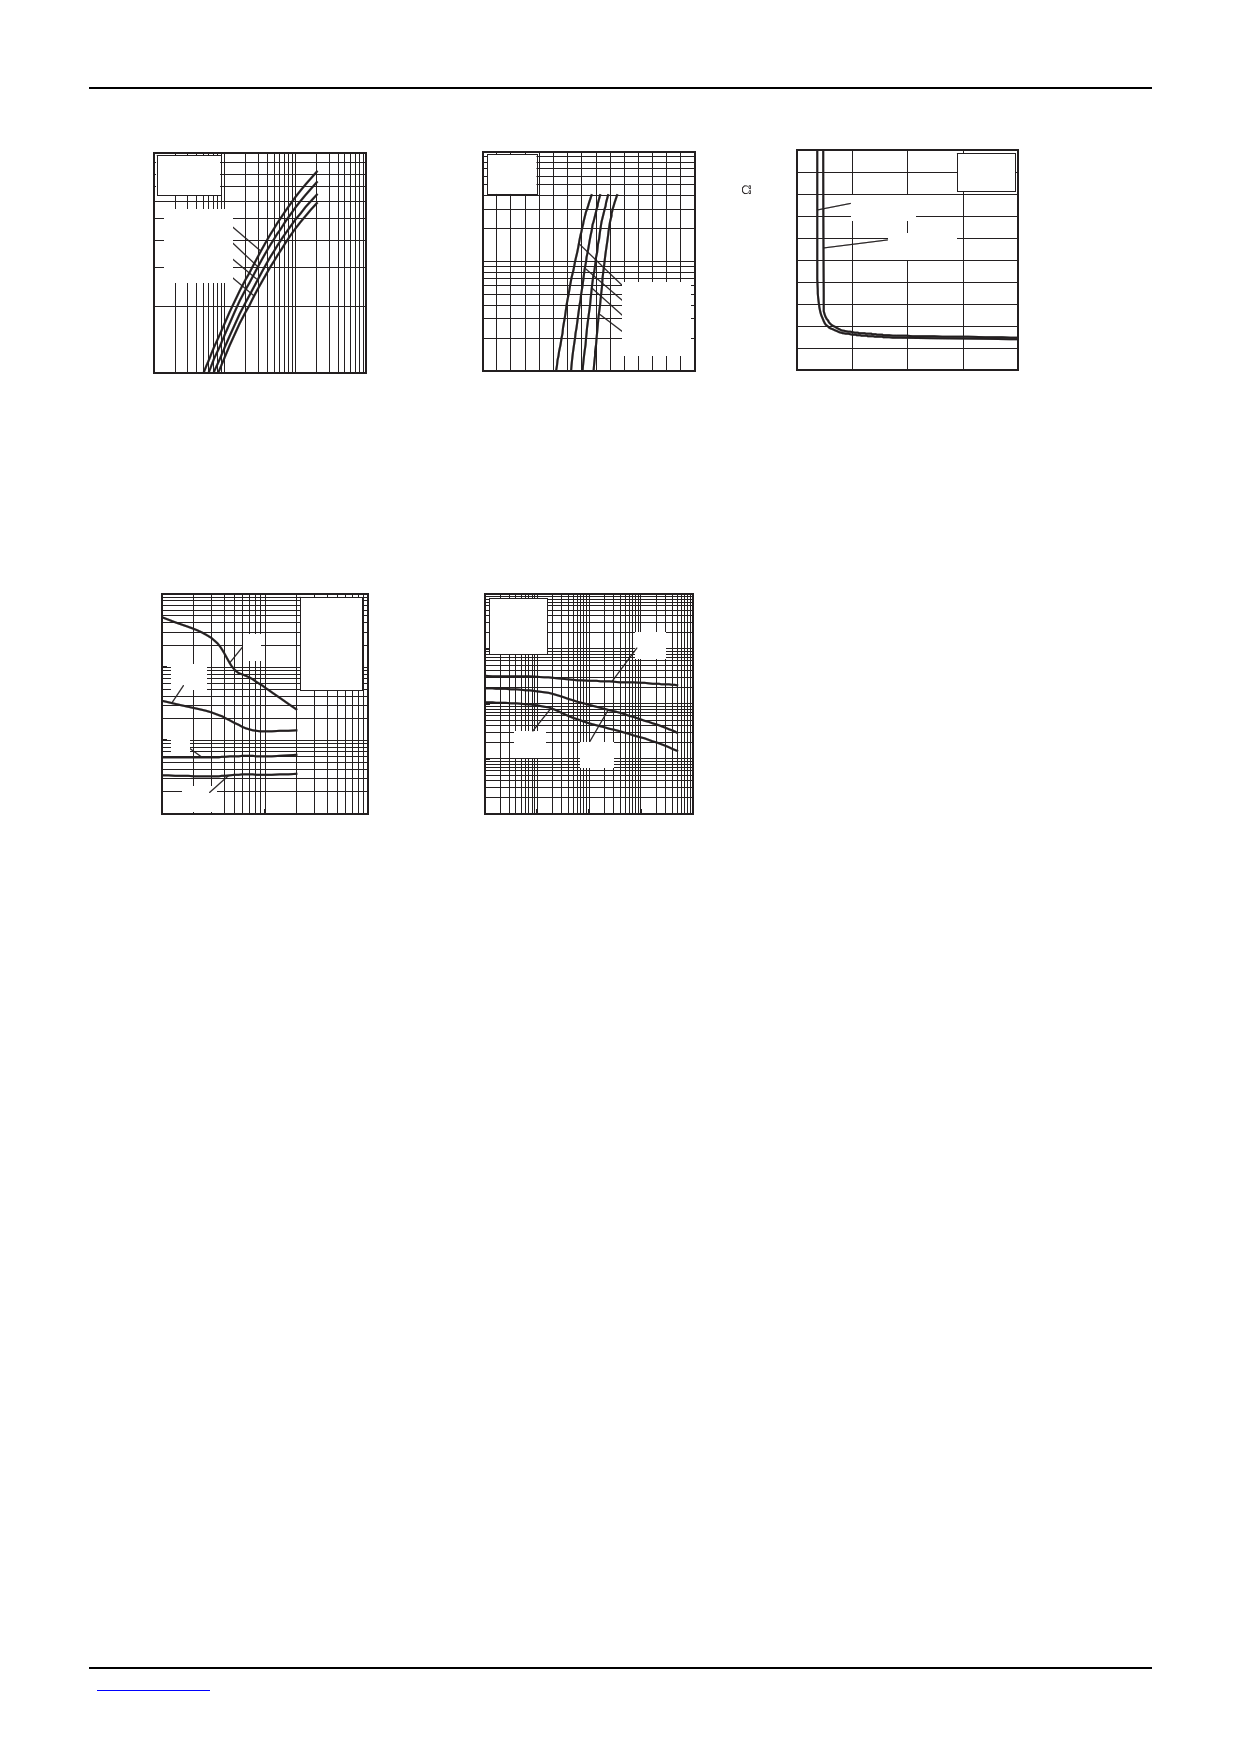 EM6K33 pdf, 전자부품, 반도체, 판매, 대치품